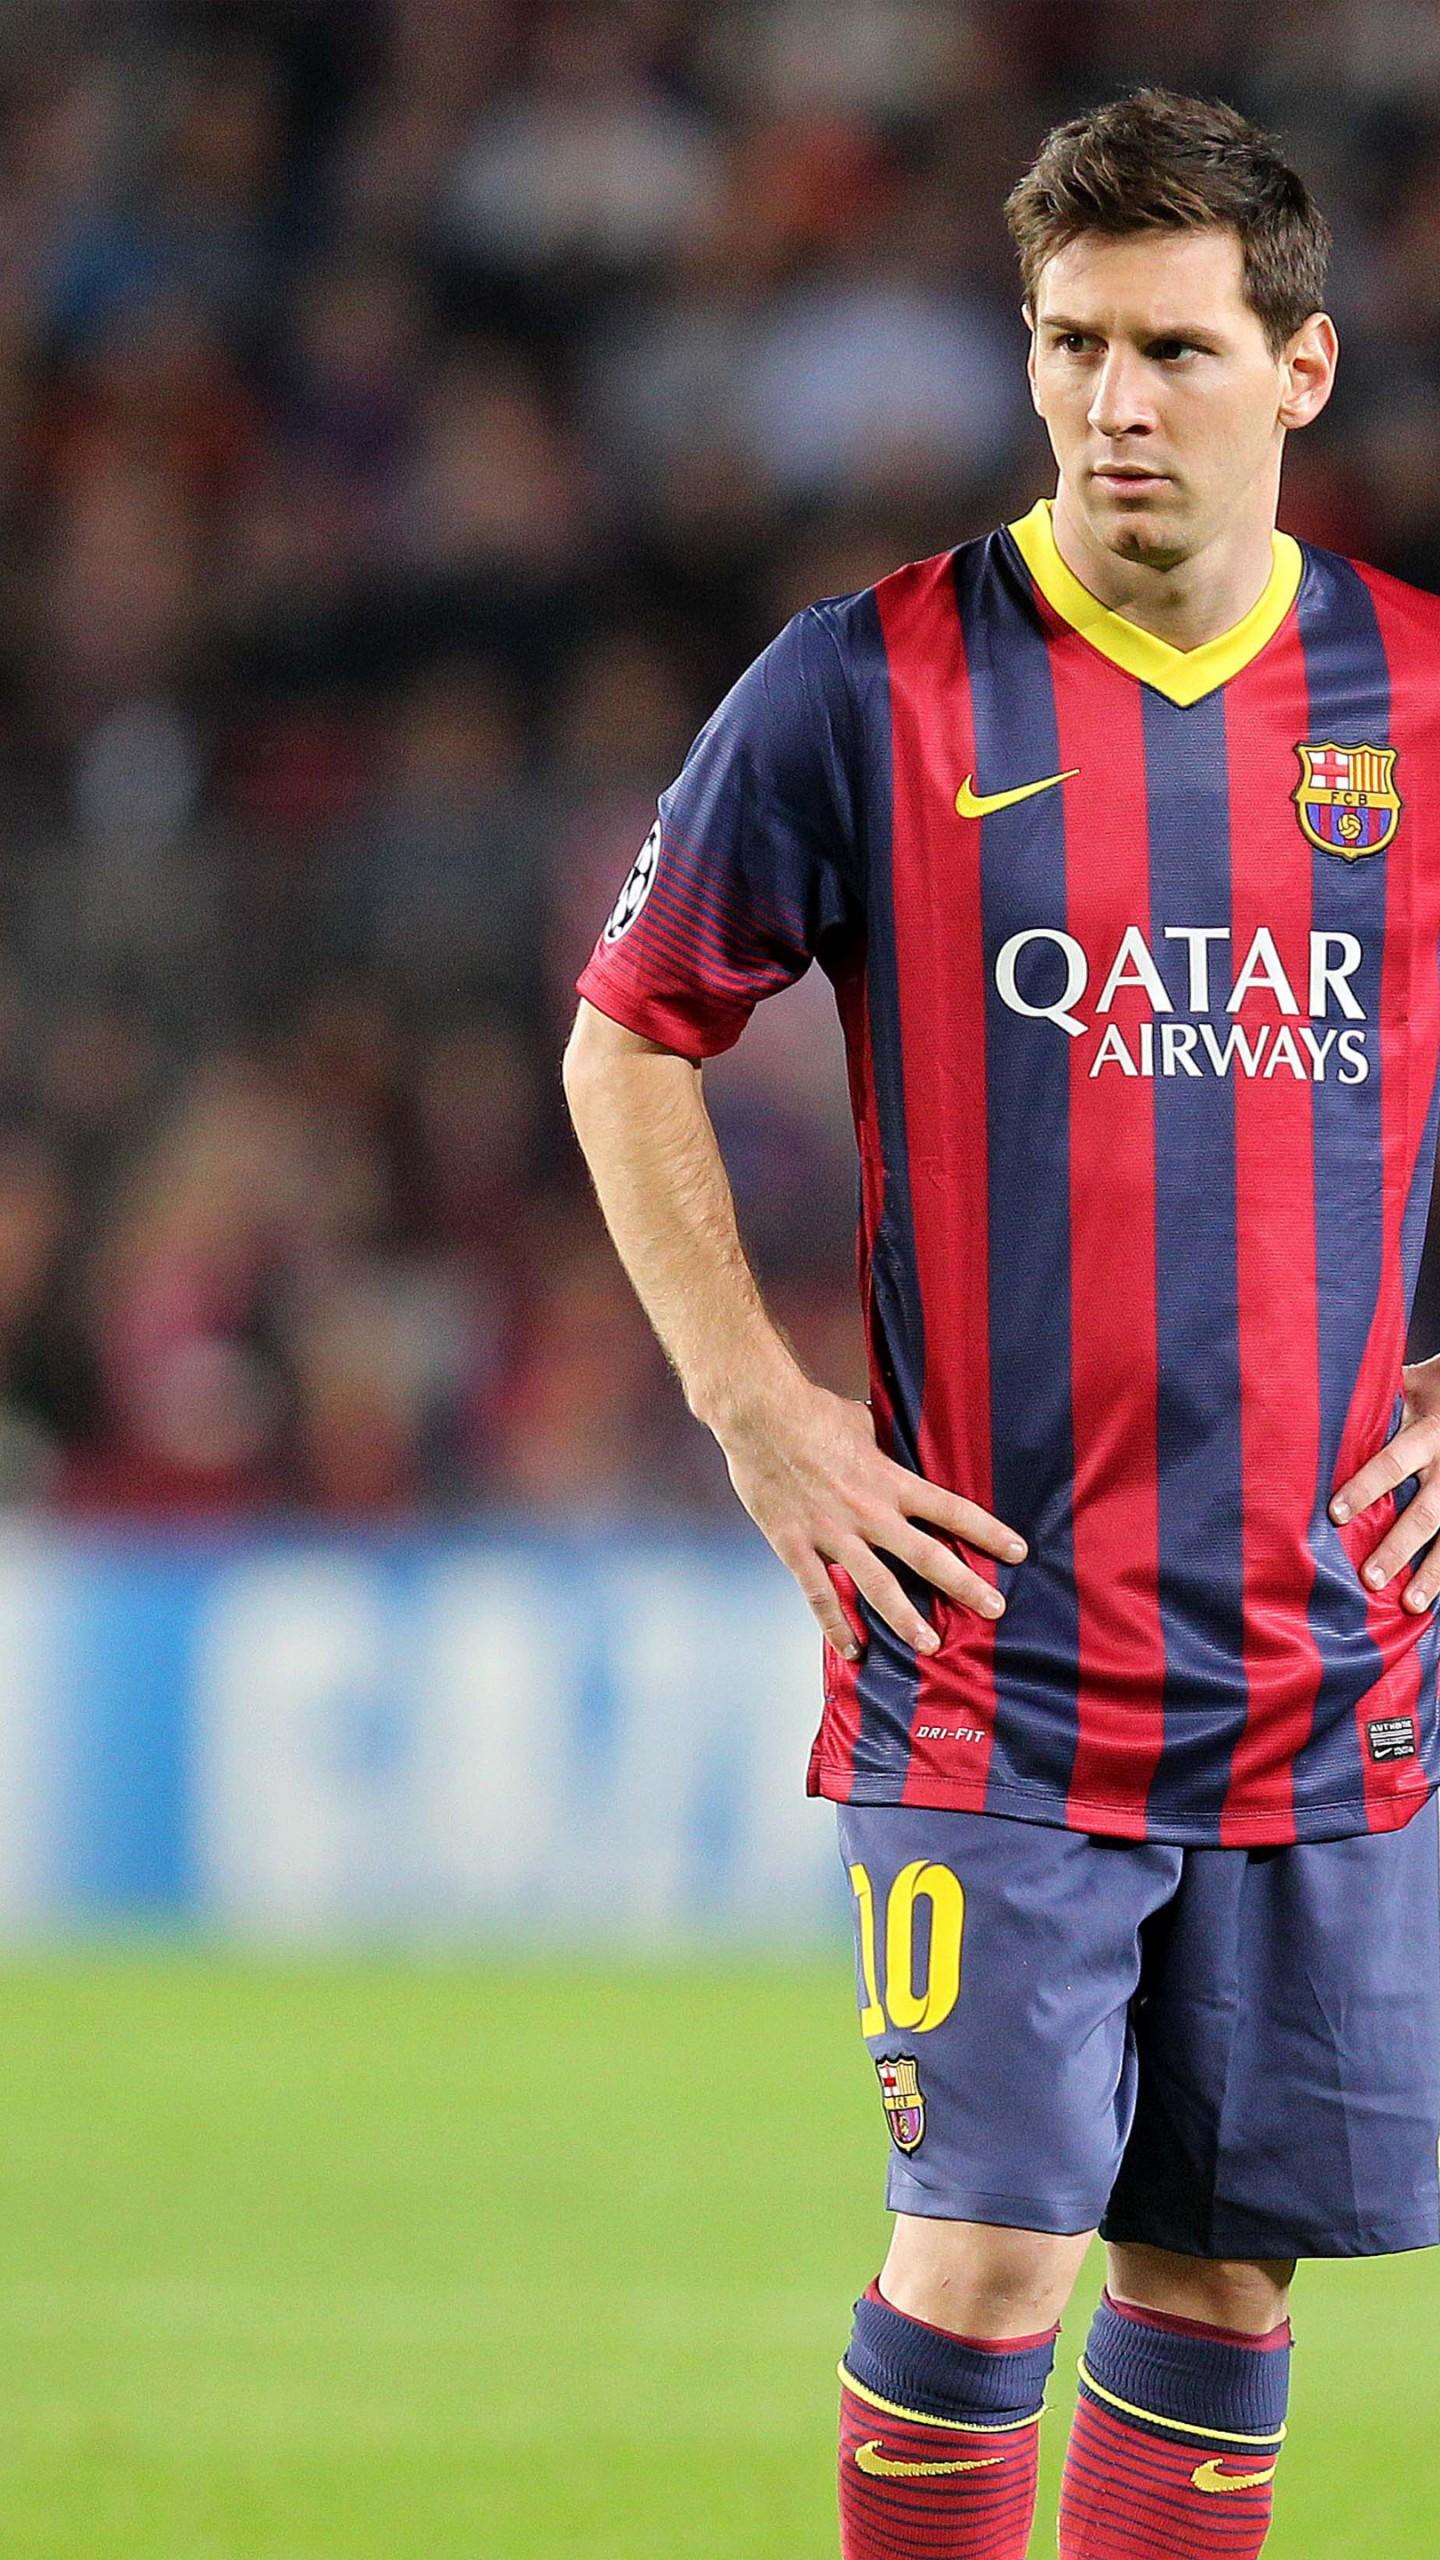 عکس زمینه لیونل مسی با تیم بارسلونا پس زمینه